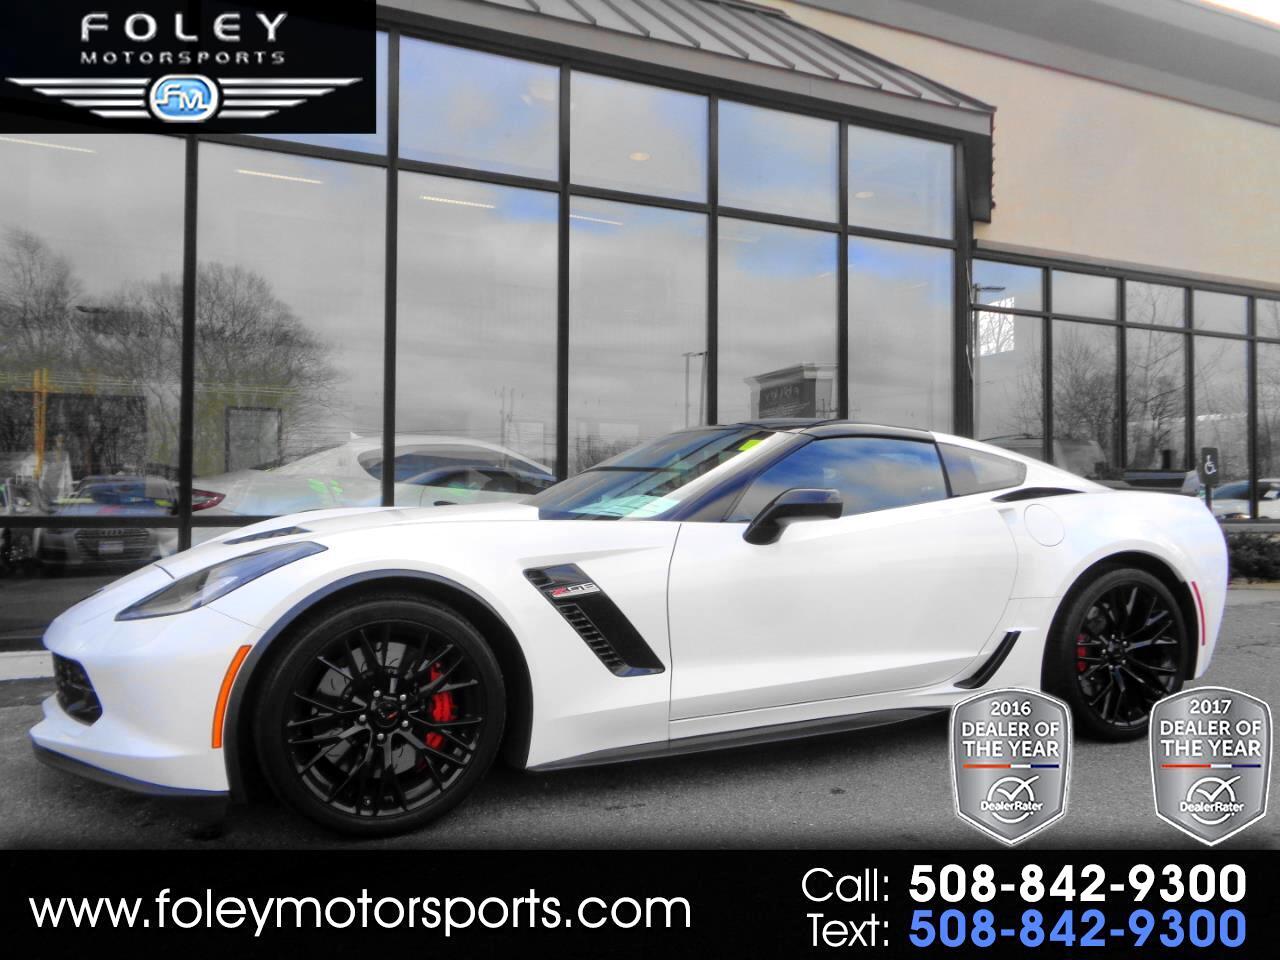 2018 Chevrolet Corvette 2dr Z06 Cpe w/1LZ